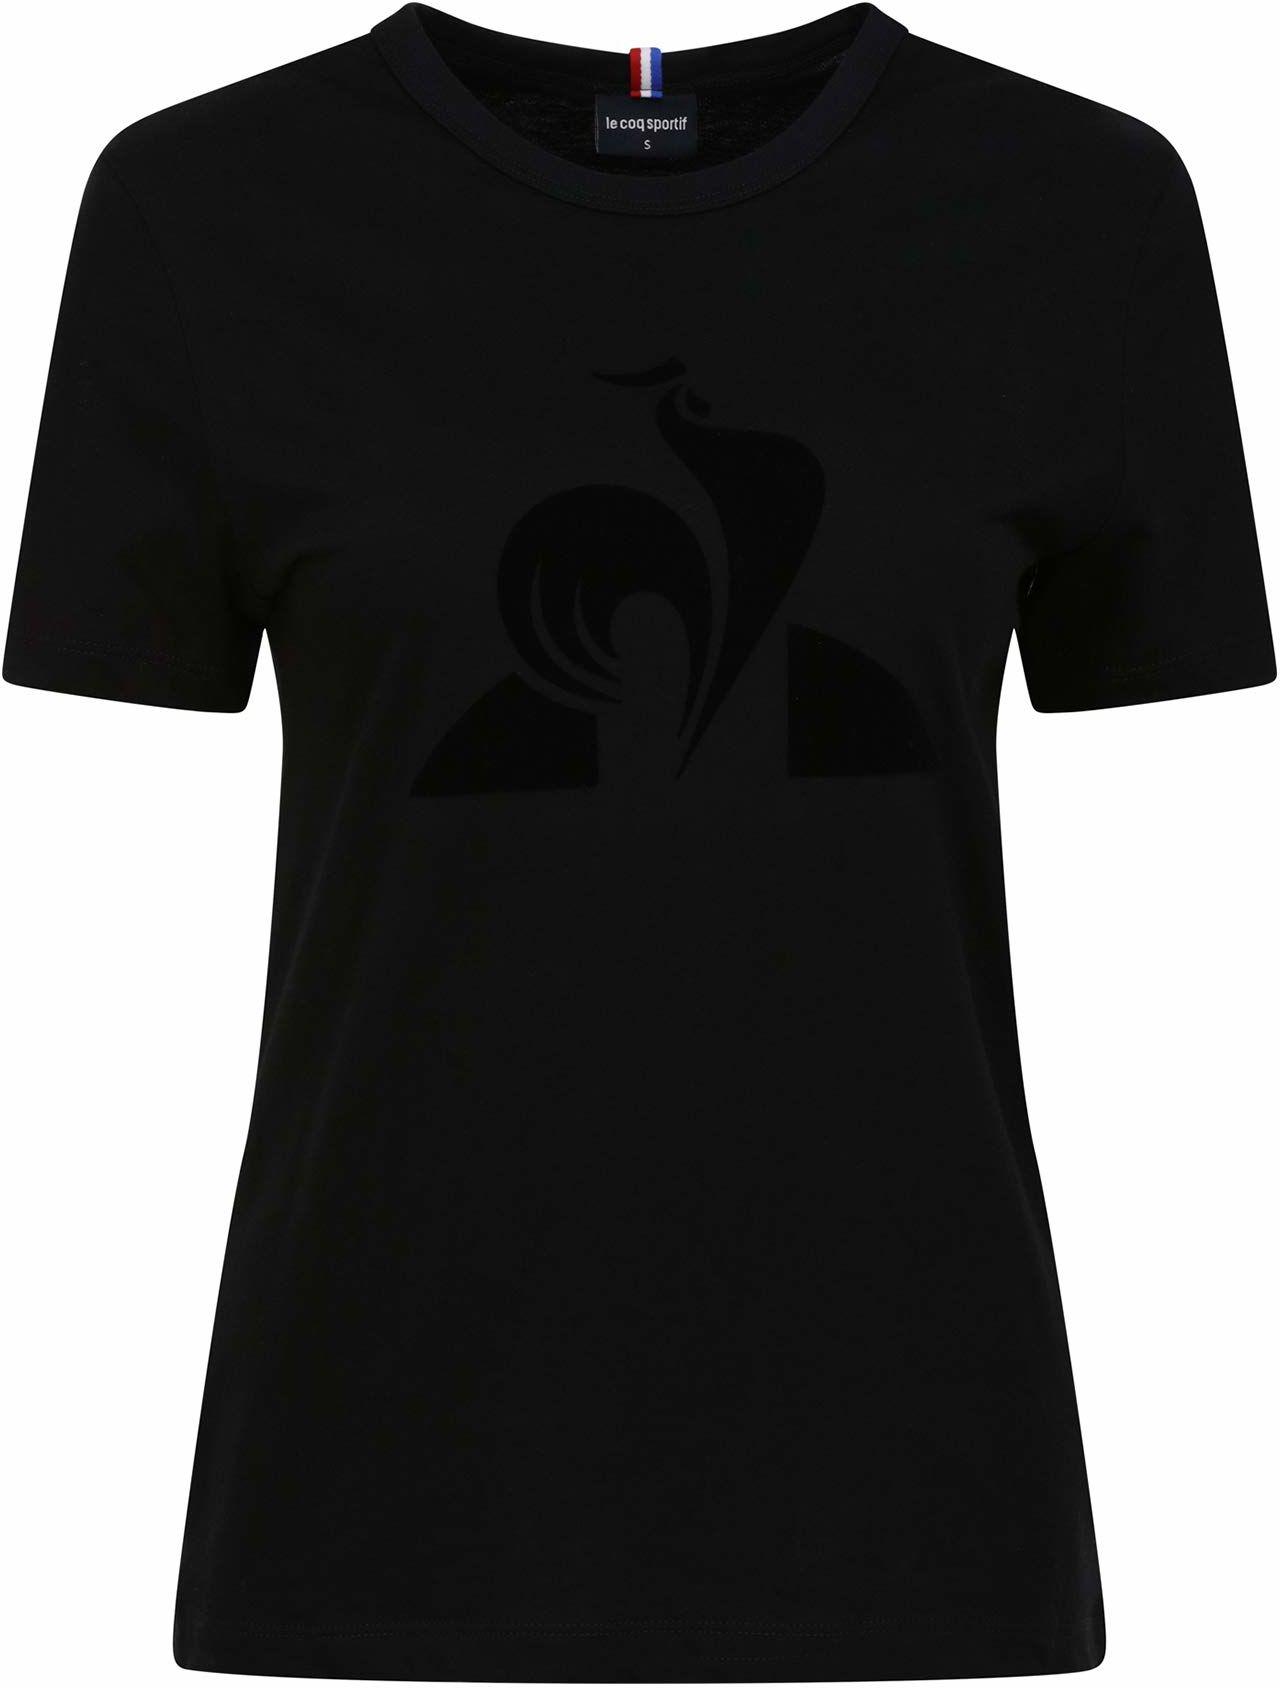 Le Coq Sportif Ess Tee Ss N 1 podkoszulek damski czarny czarny X-S